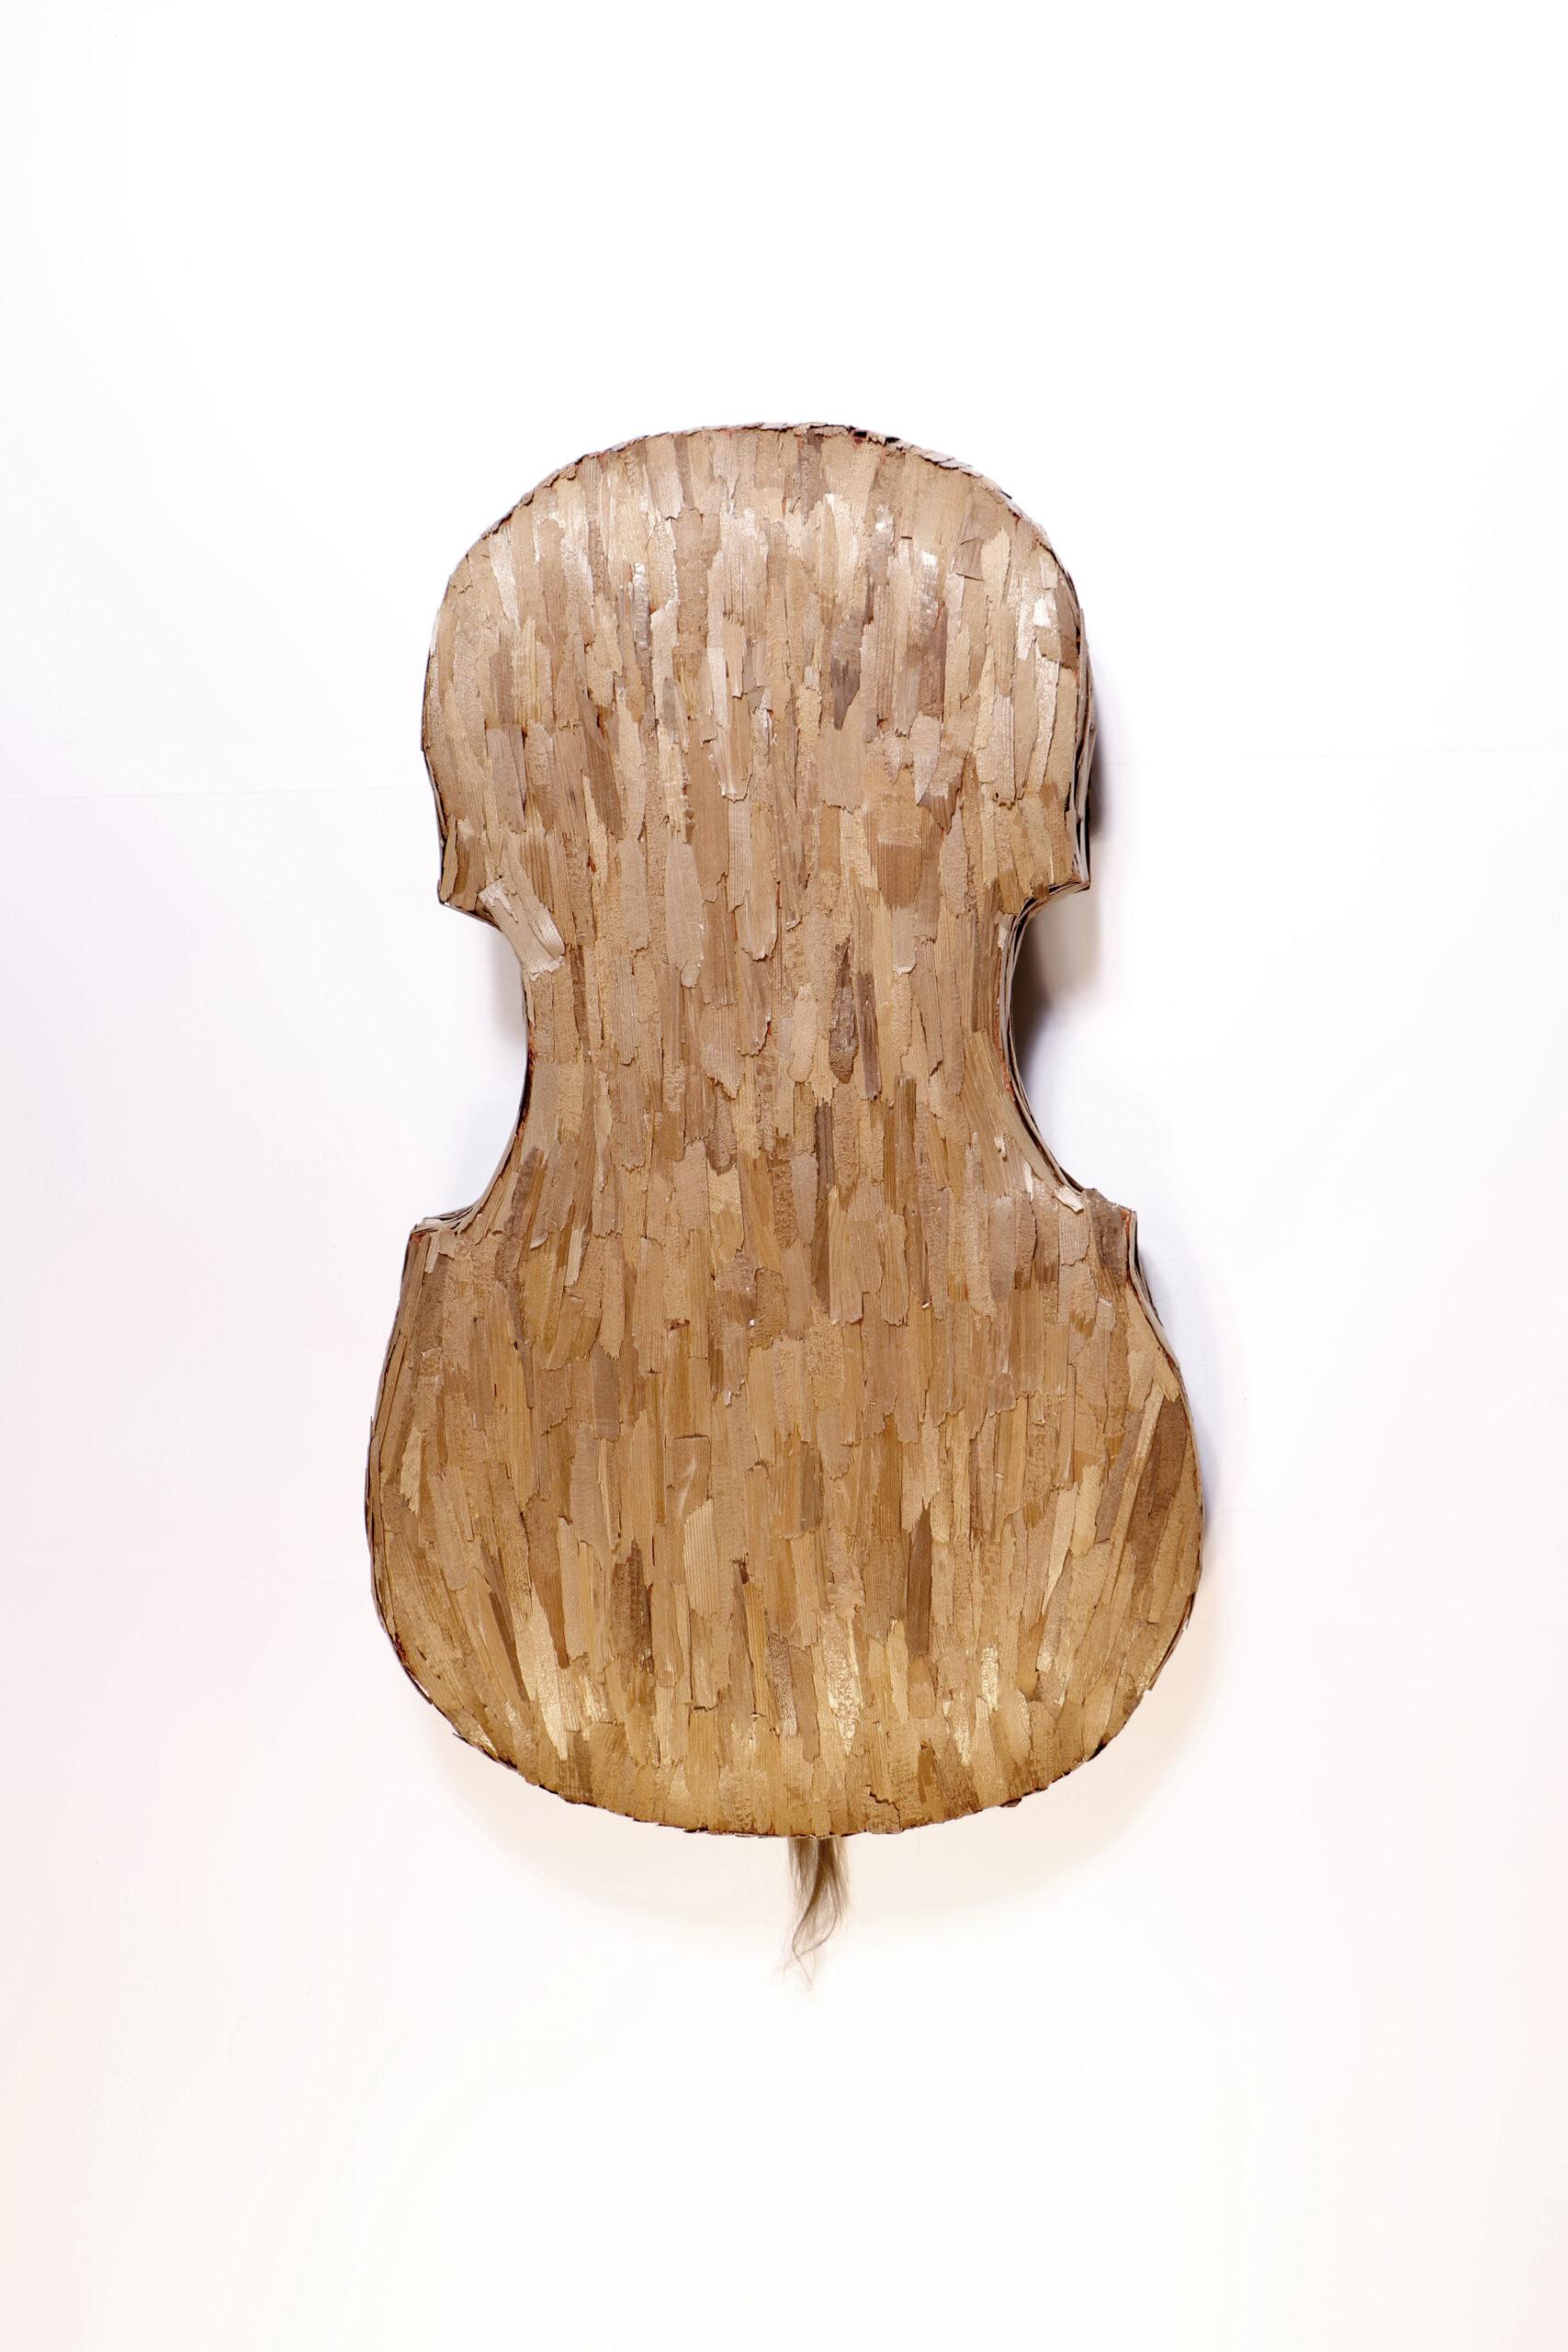 Cello 2011<div style='clear:both;width:100%;height:0px;'></div><span class='desc'>Afmetingen: 13 x 45 x 75 cm <br>Materiaal: Mensenhaar, cederhout, leer, polyester <br>Foto: Studio Zelden <br>Residentie I-Park Connecticut US</span>